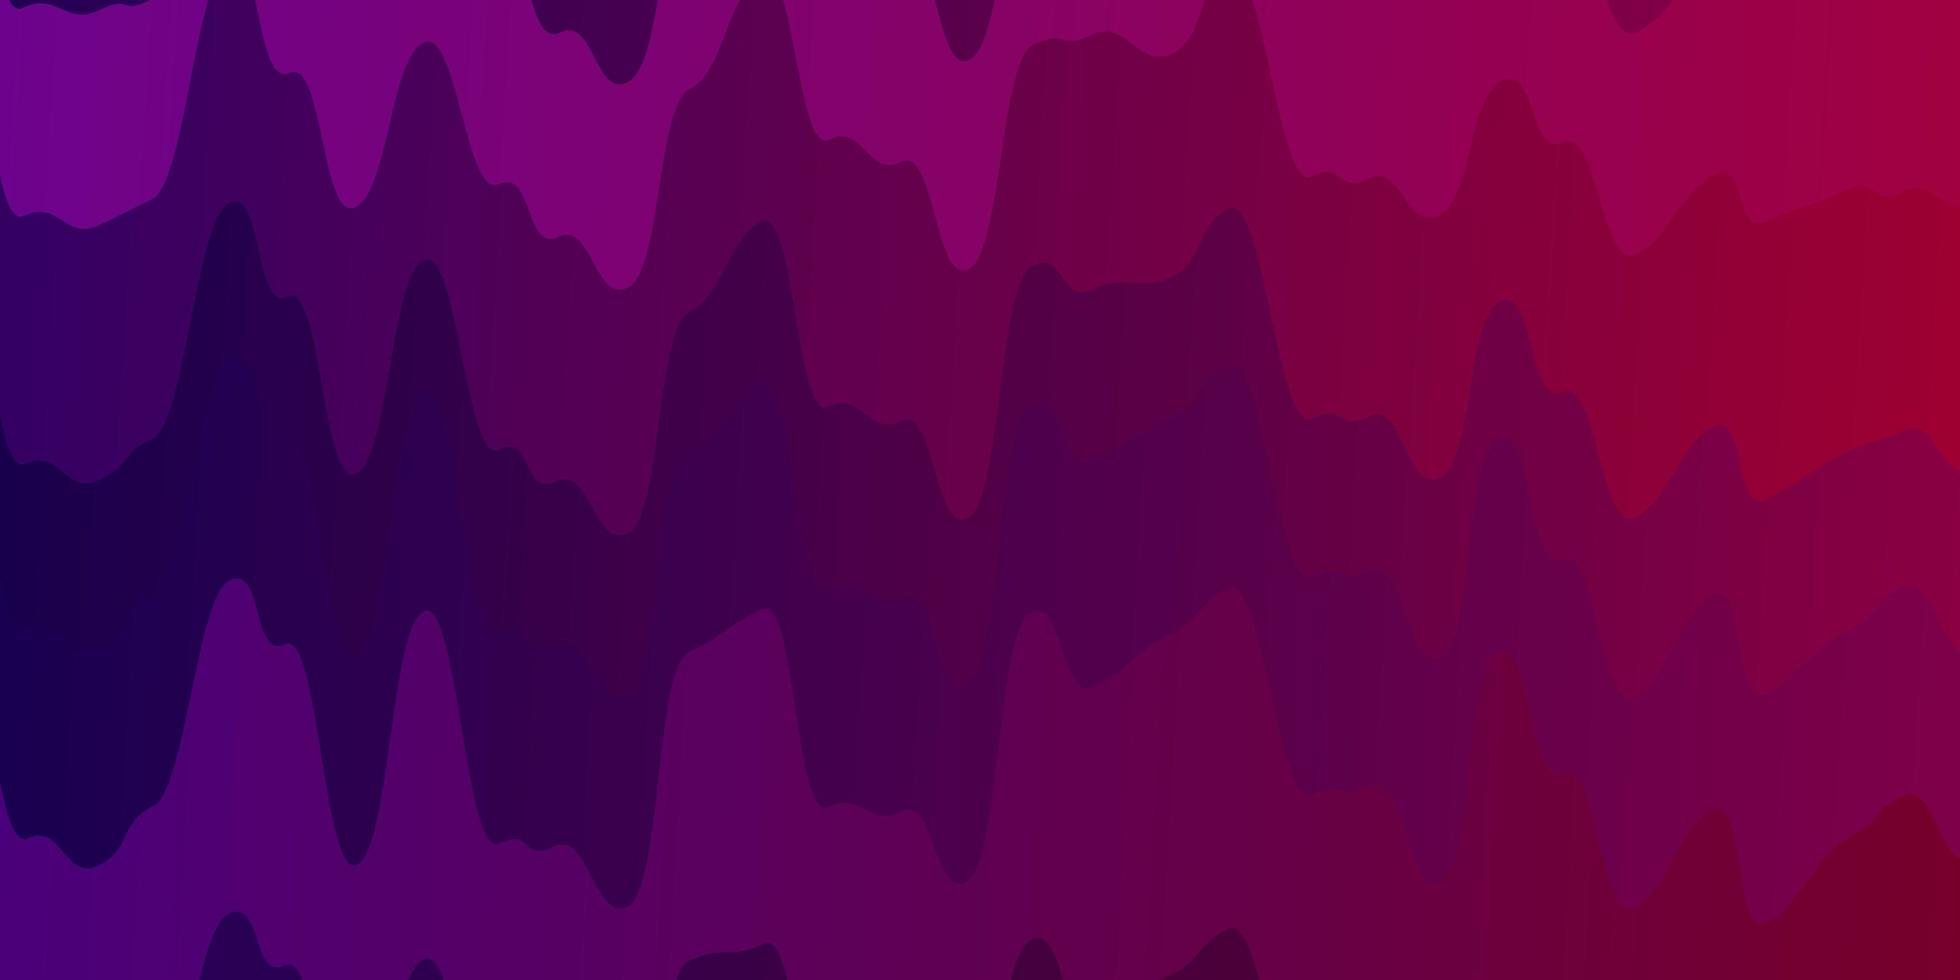 layout de vetor roxo escuro, rosa com curvas.